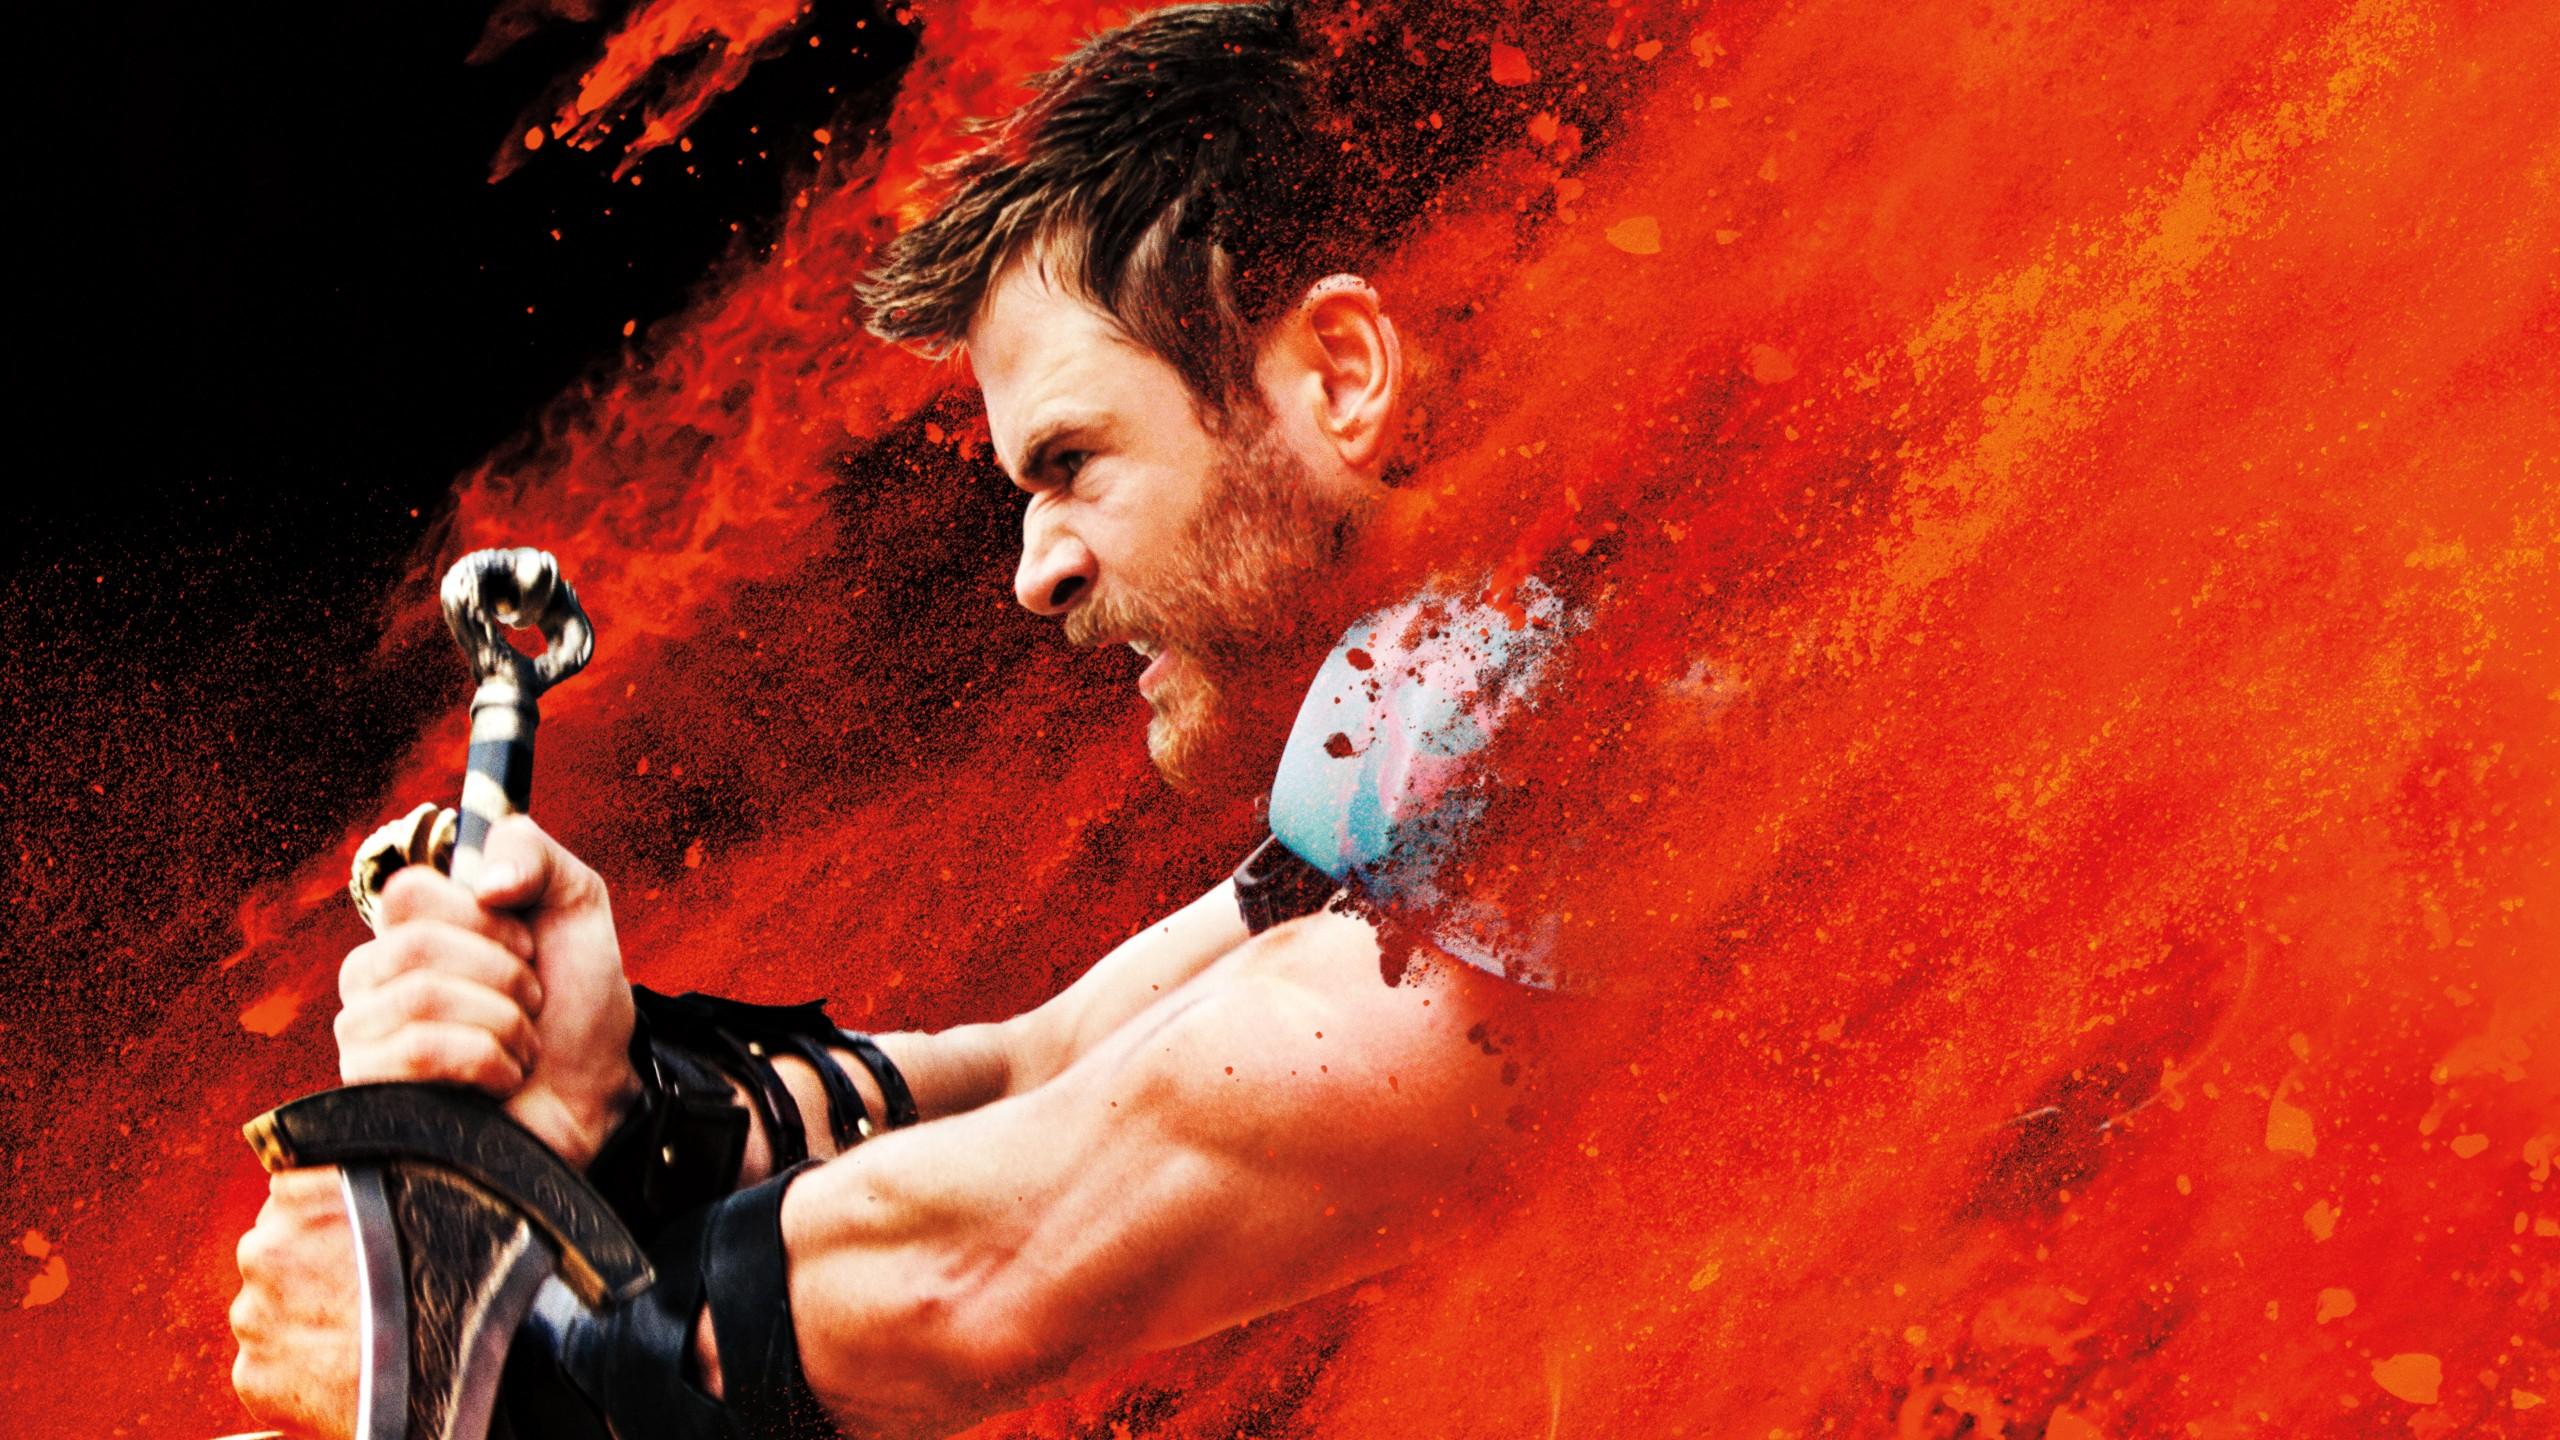 Thor Ragnarok Chris Hemsworth 4k Wallpapers Hd Wallpapers